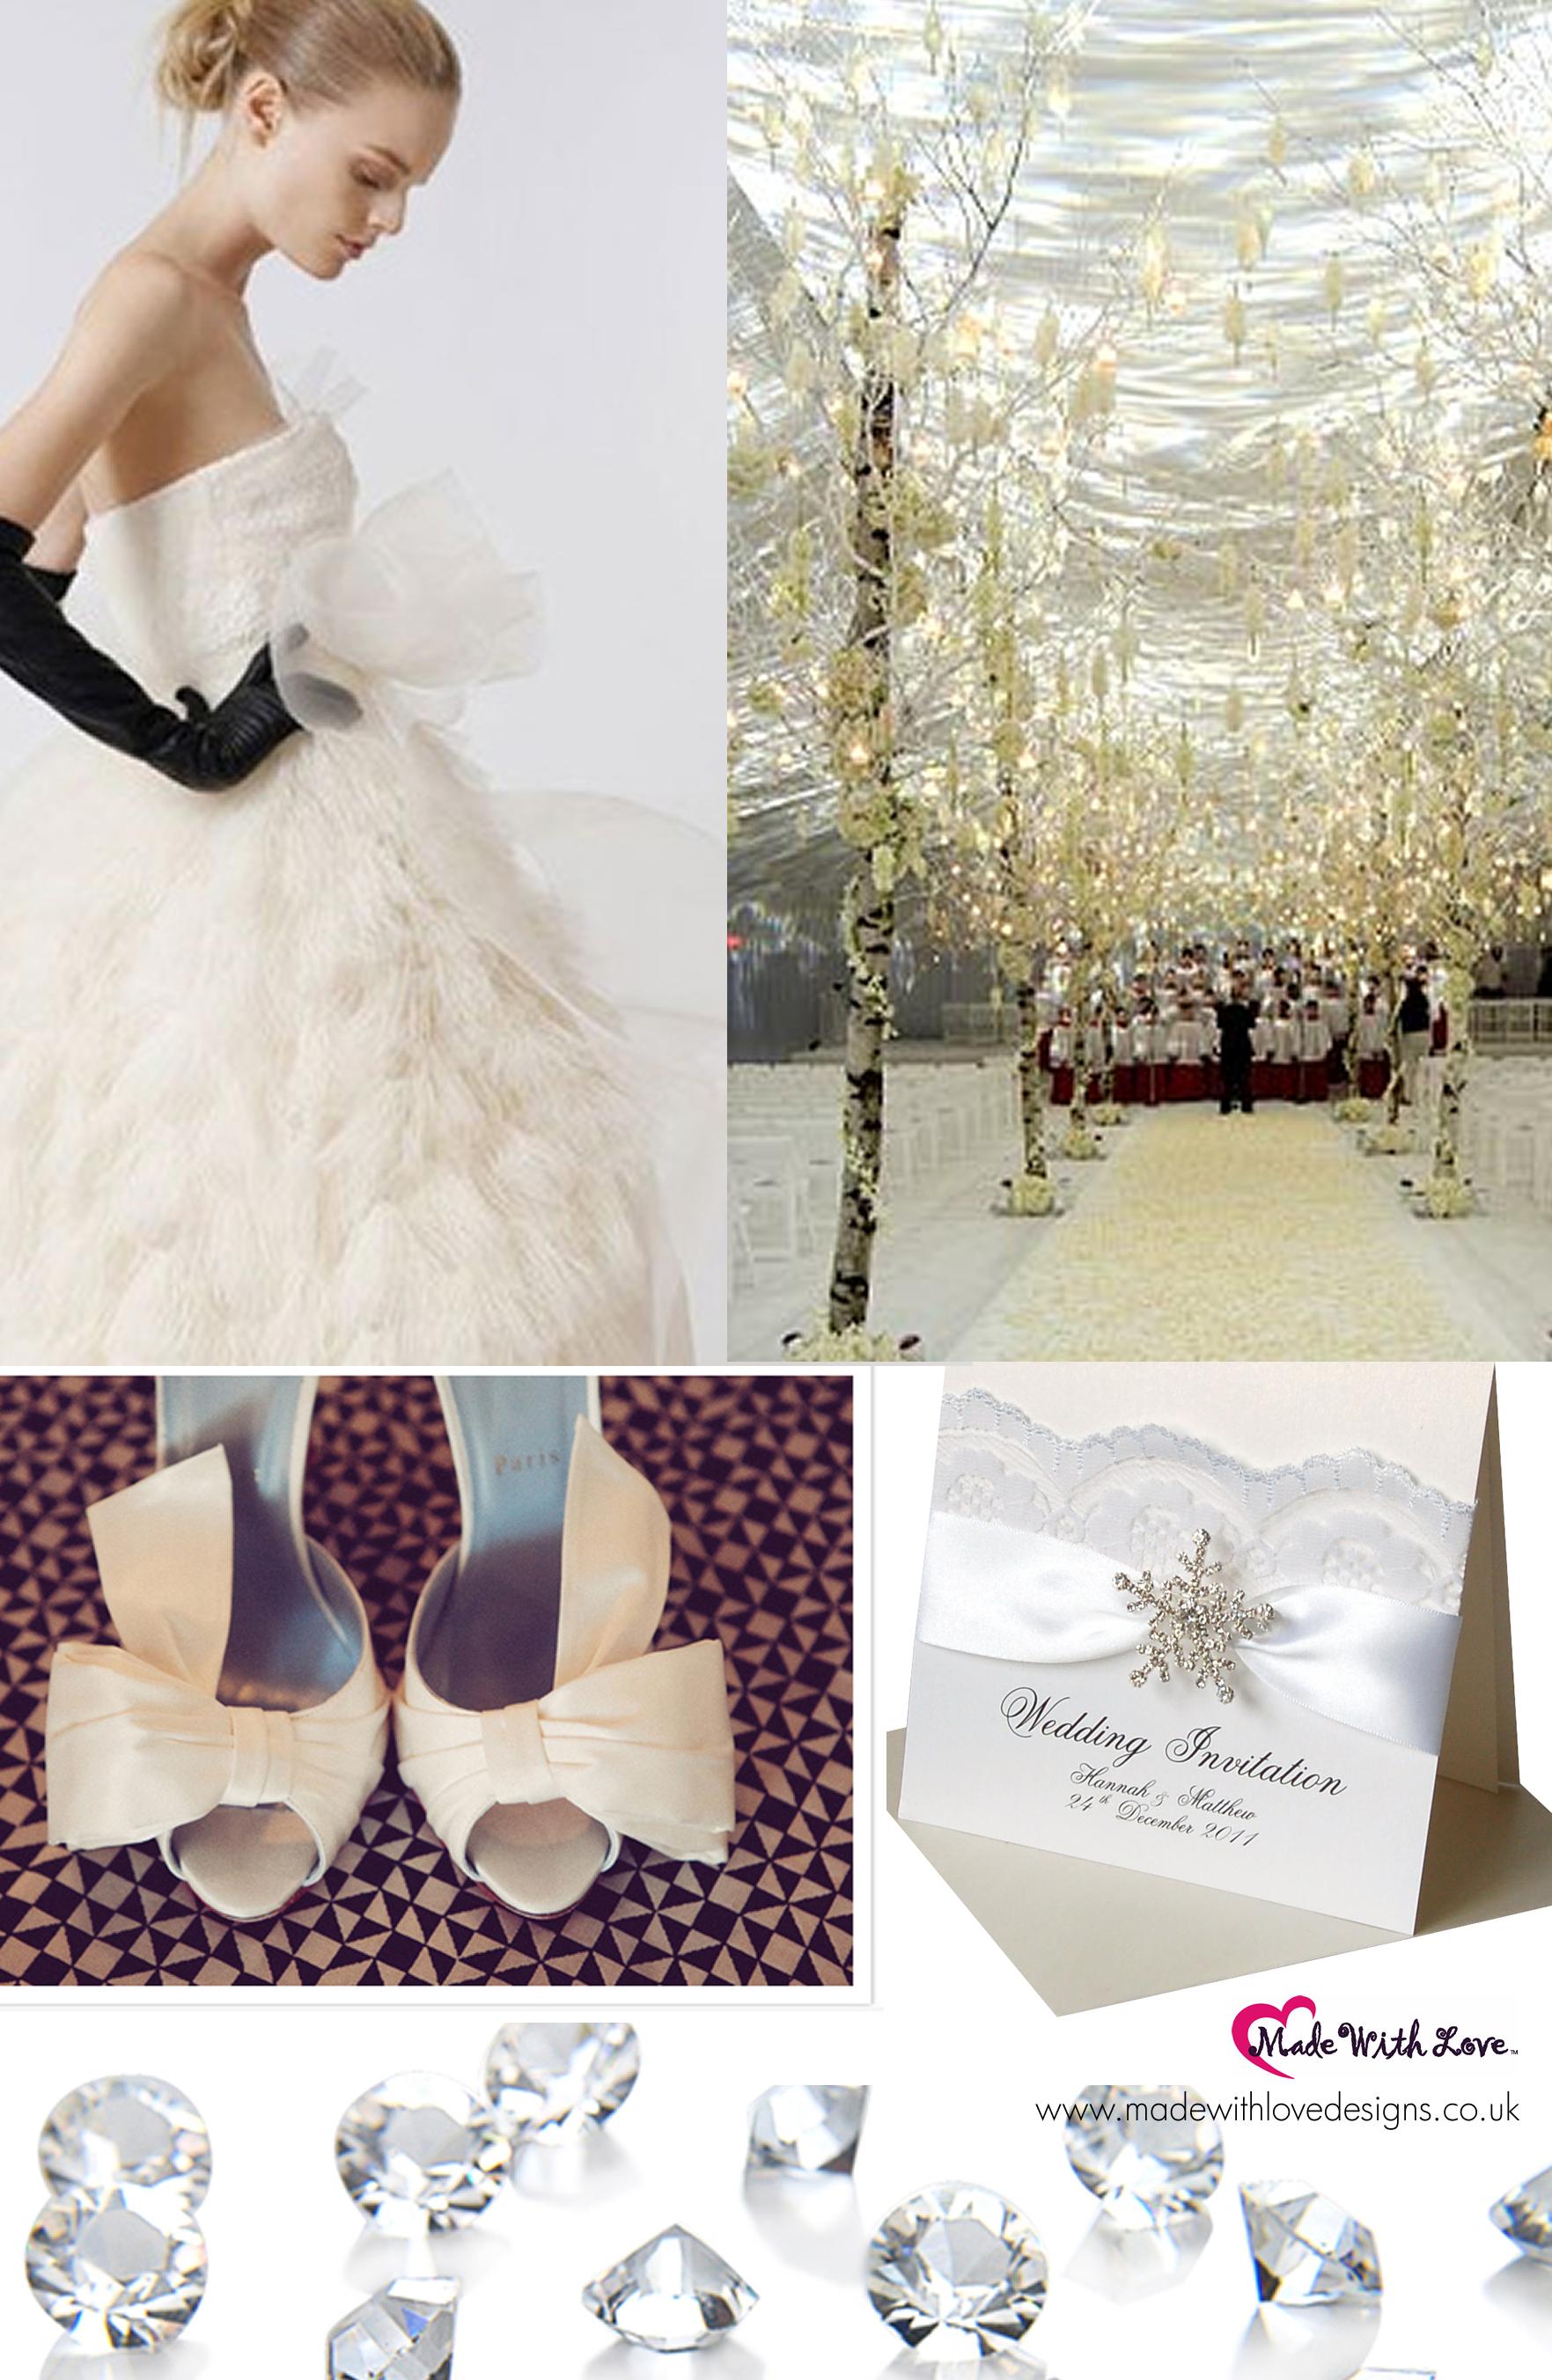 Winter Wedding Invitations Snowflake Crystal Winter weddings